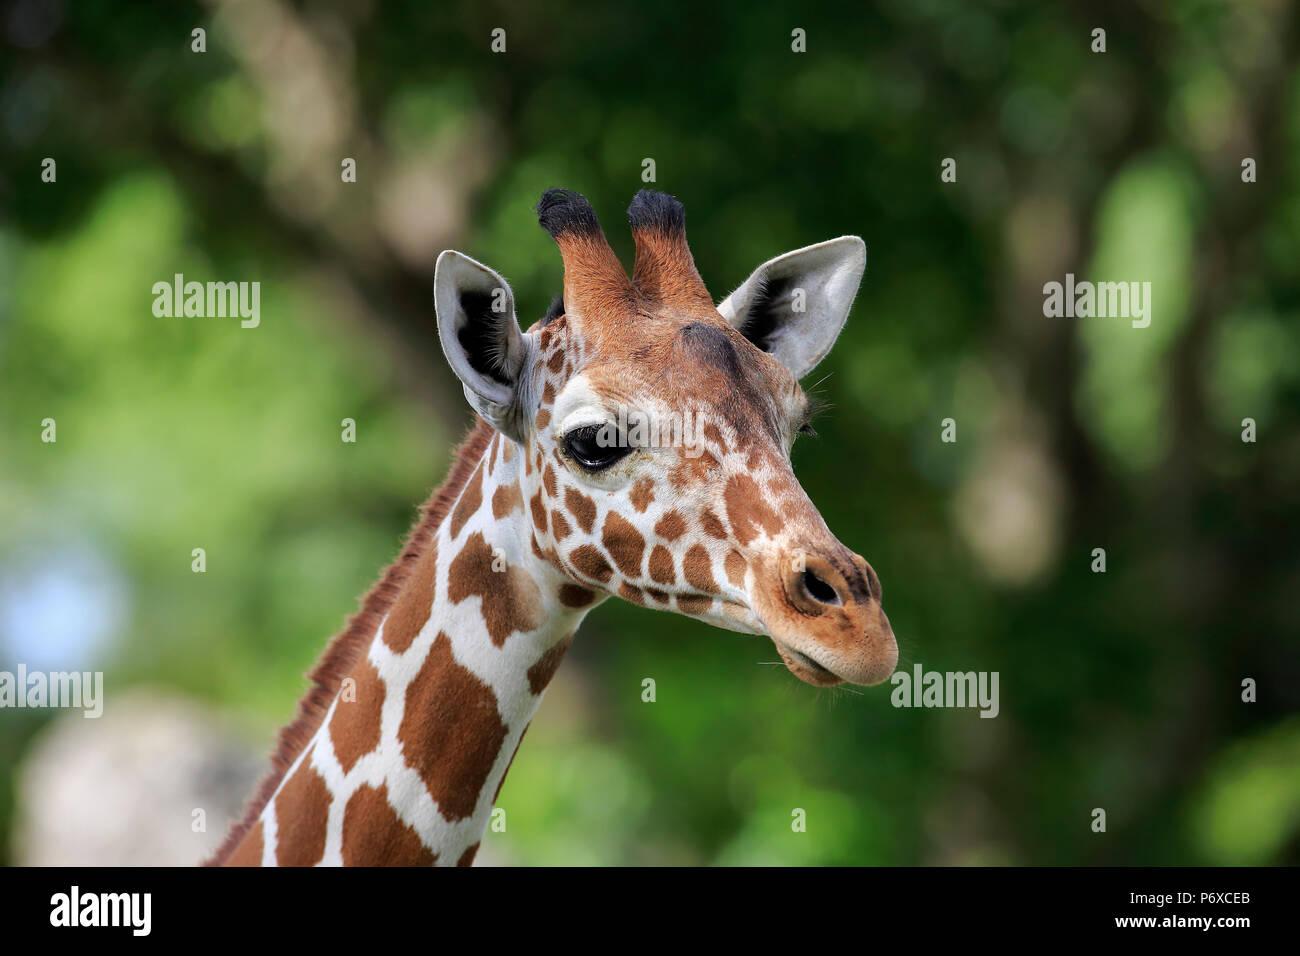 Giraffe réticulée, portrait adultes, l'Afrique, Giraffa camelopardalis reticulata Photo Stock